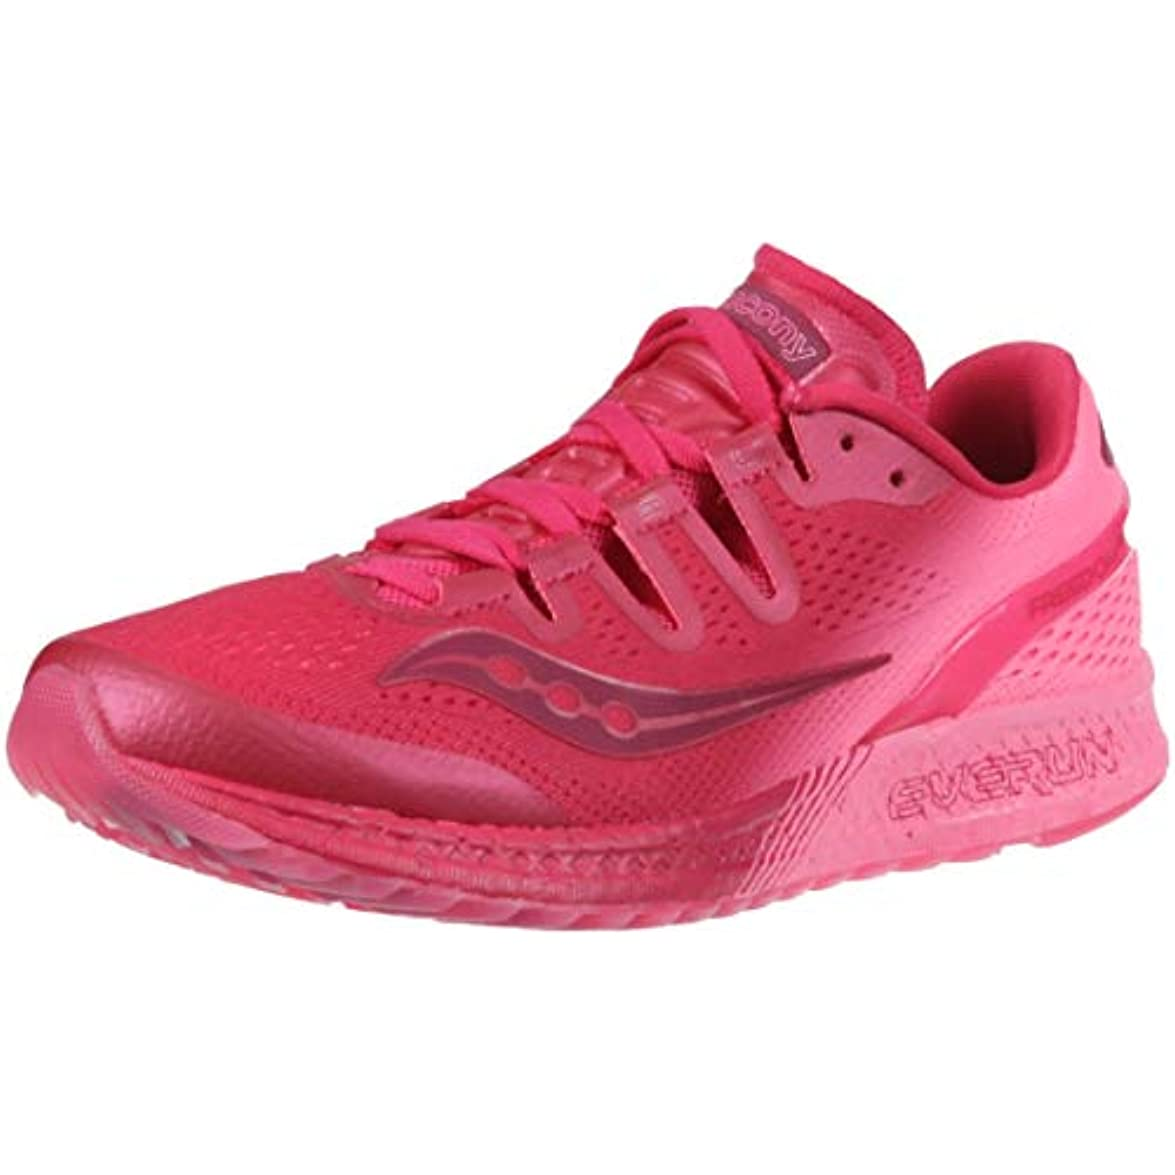 Adidas Freedom Iso Scarpe Running Donna